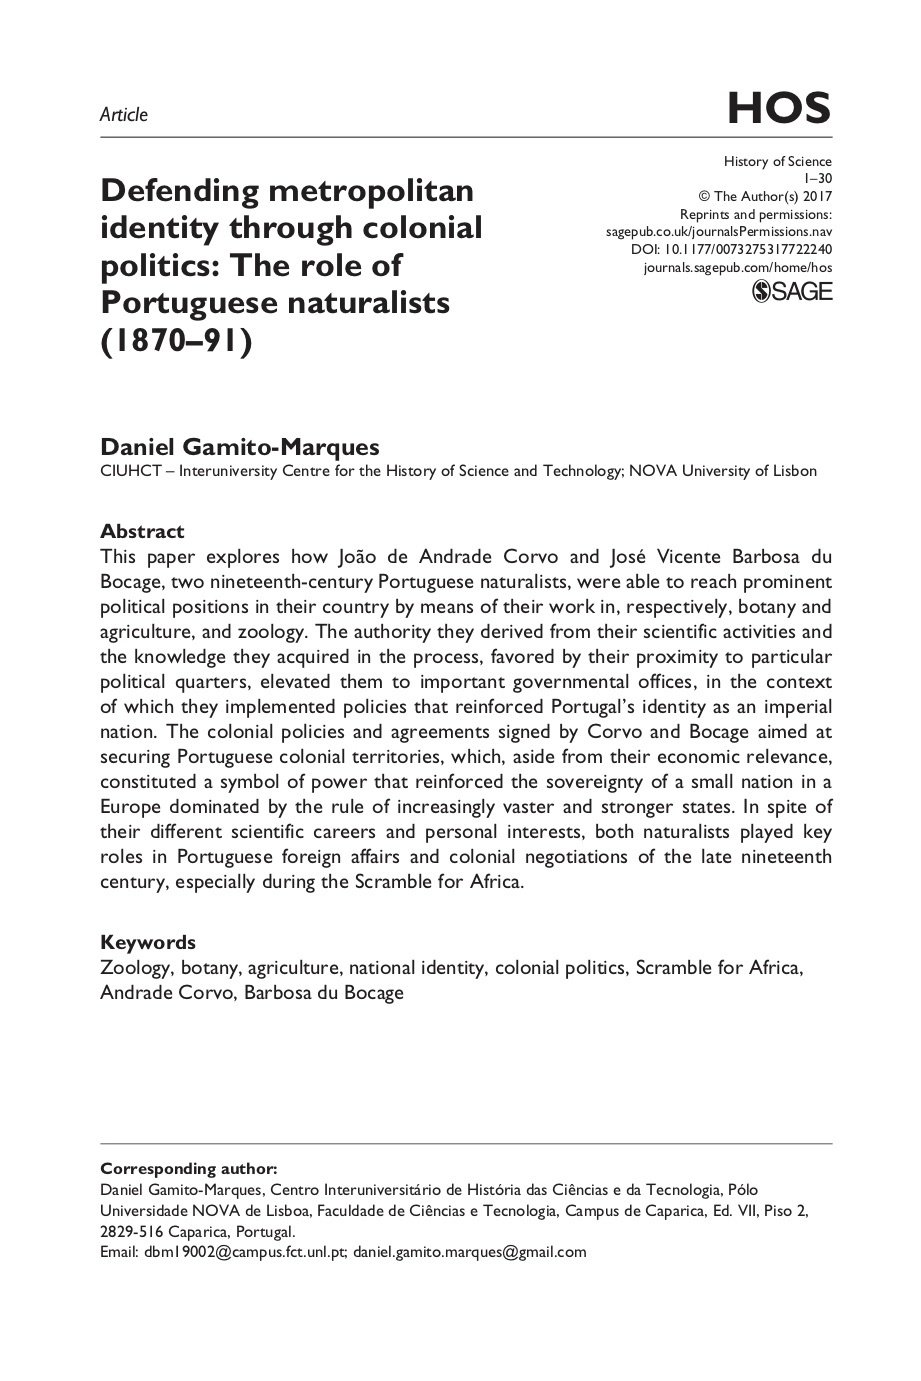 Defending metropolitan identity through colonial politics: The role of Portuguese naturalists (1870–91), Capa